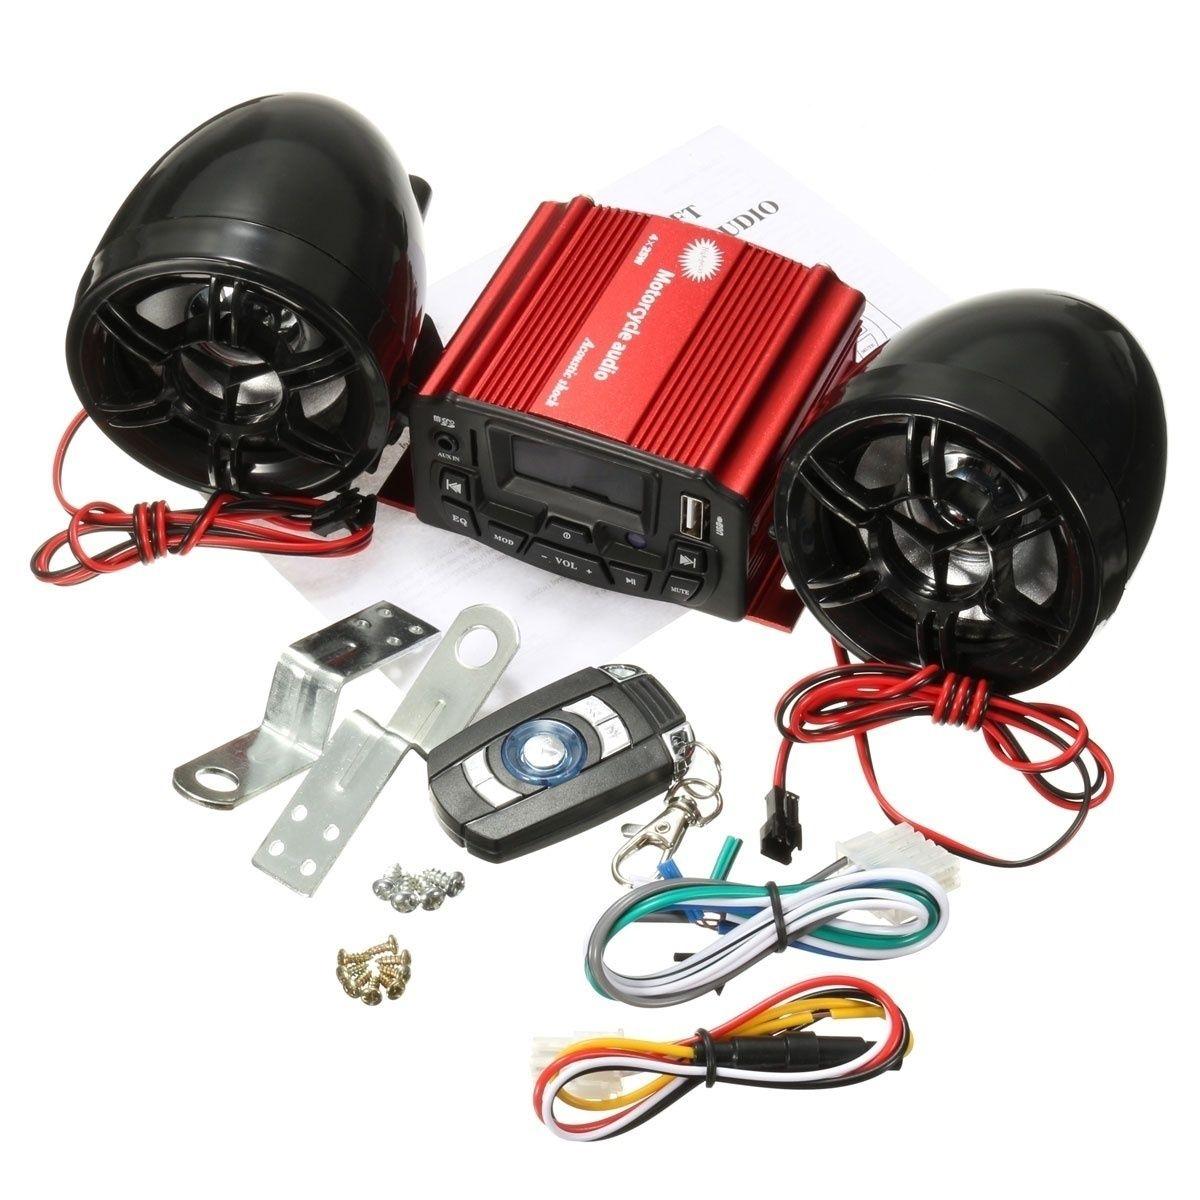 12V 4x25W سيارة دراجة نارية دراجة نارية MP3 FM مشغل الصوت نظام راديو مكبر للصوت ستيريو 2X رئيس اللاسلكي عن بعد (اللون: أسود، أحمر)